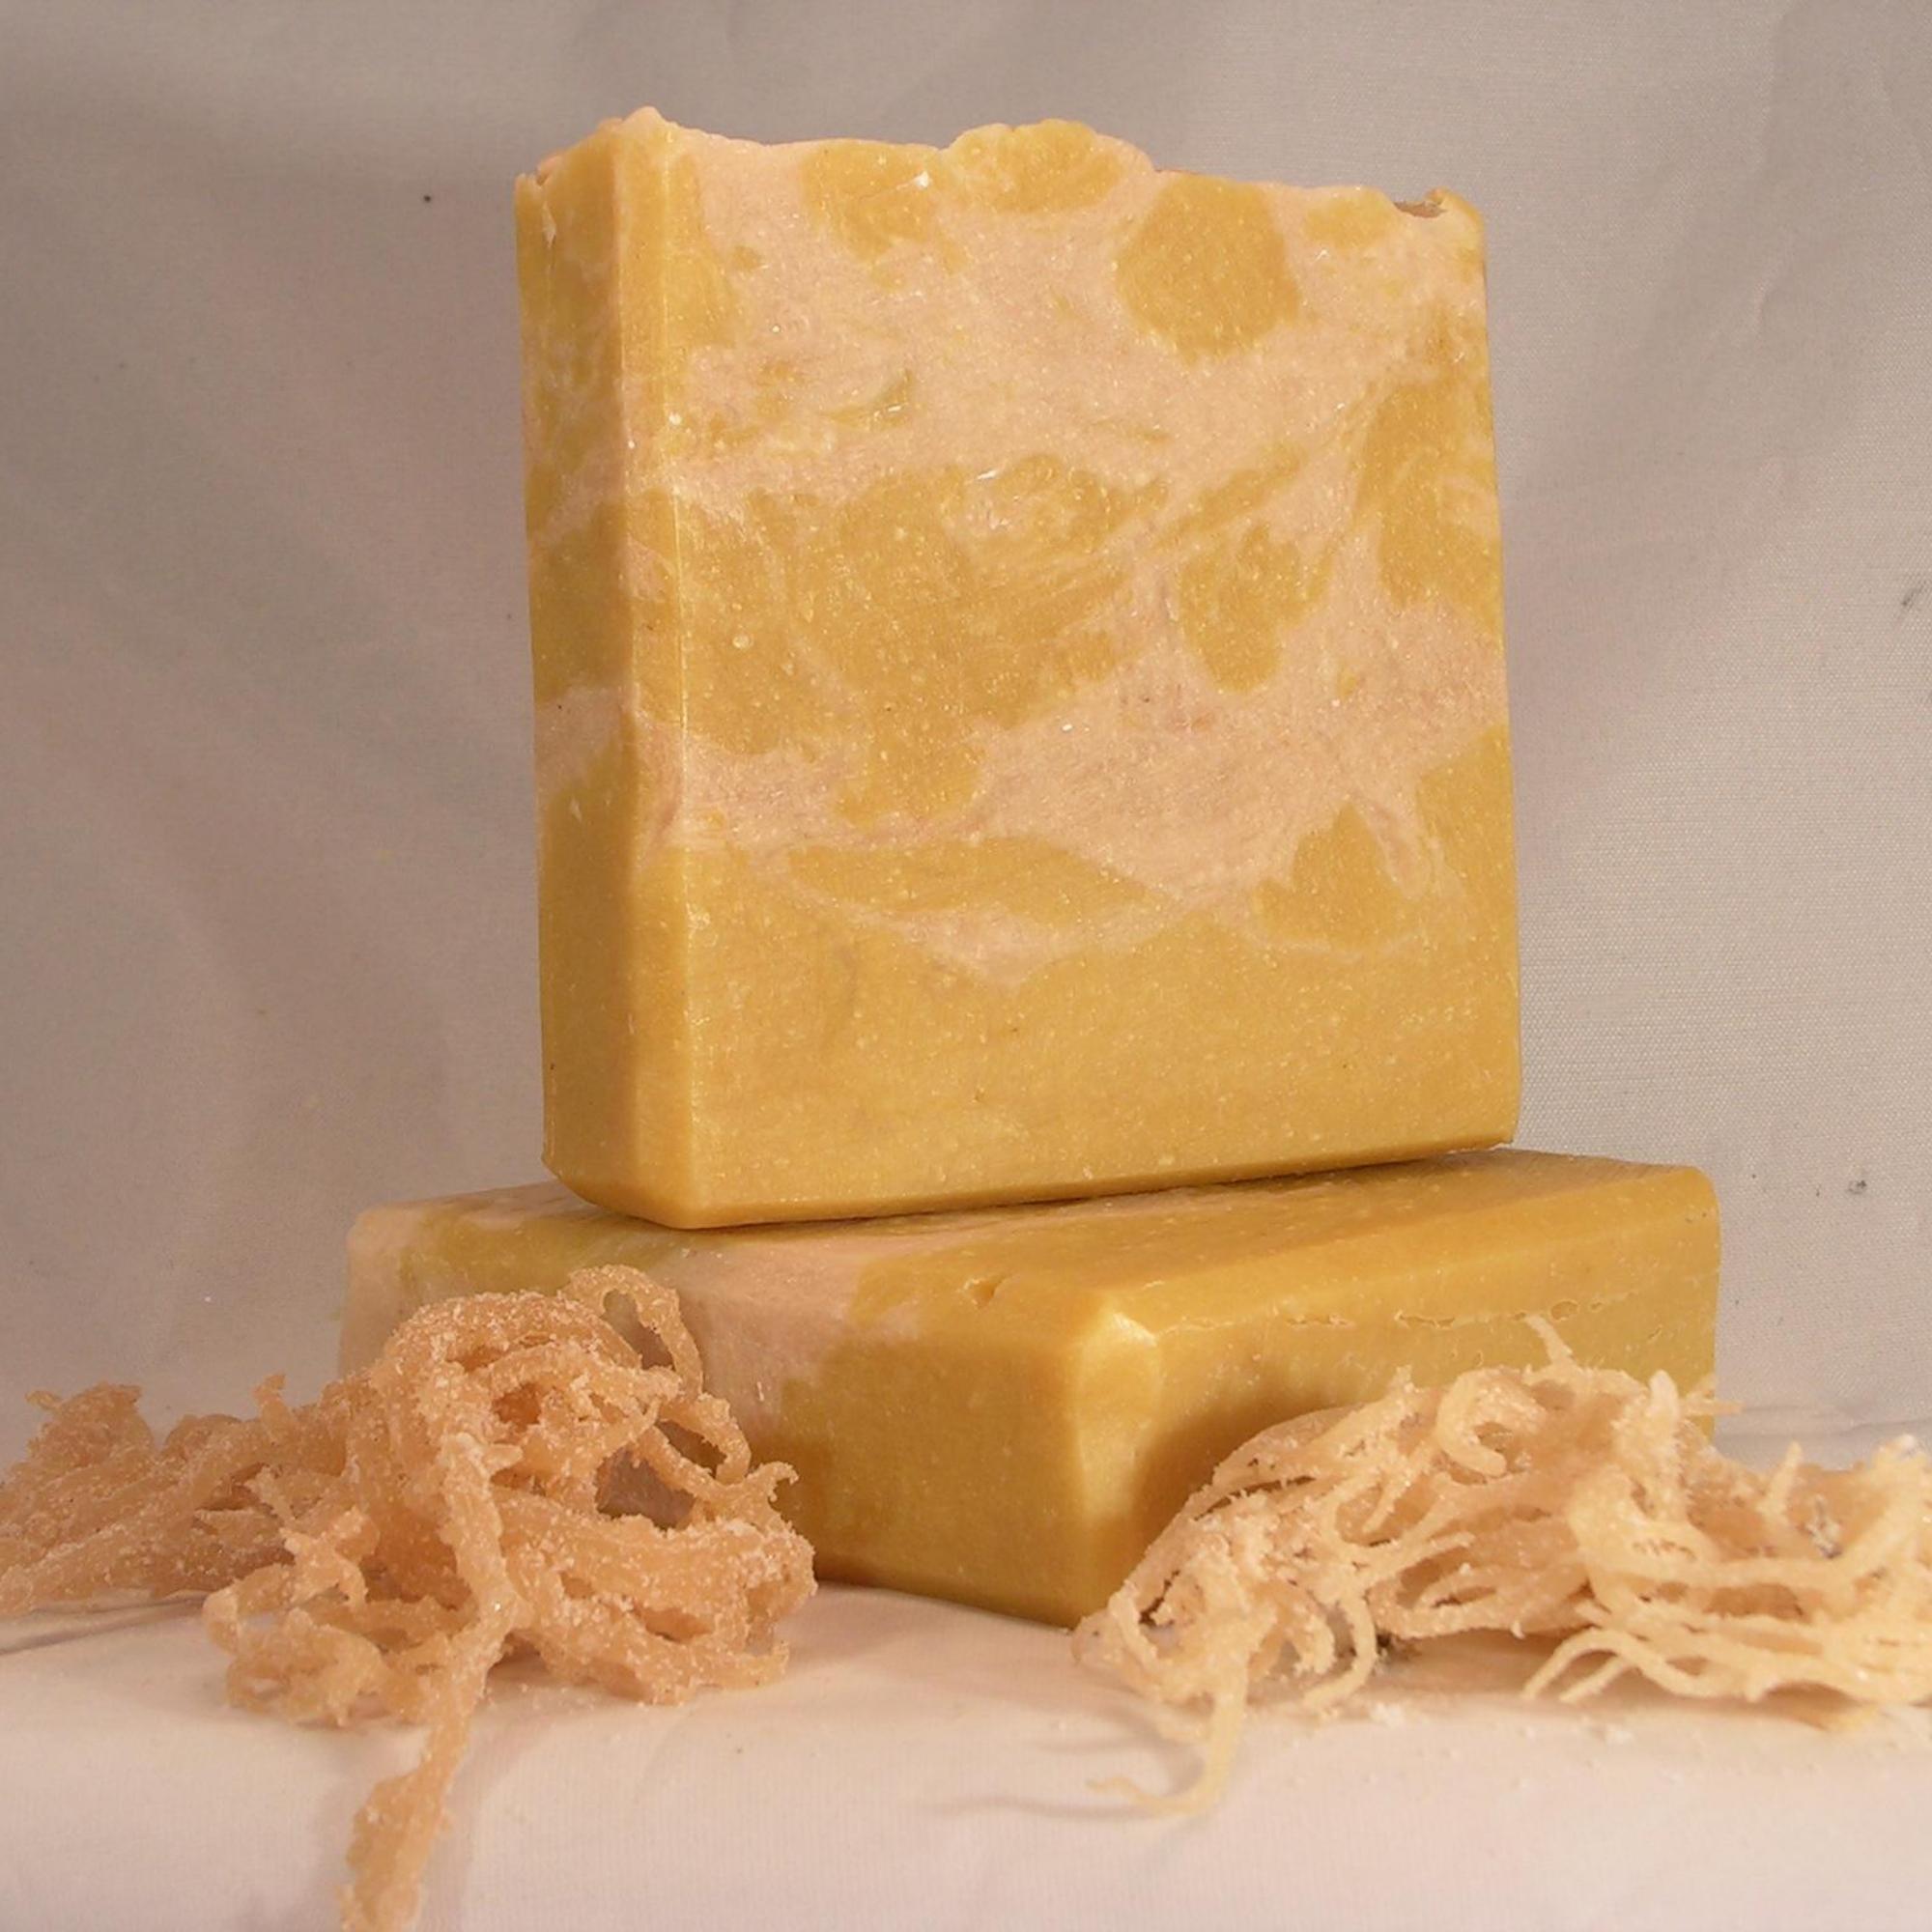 Sea Moss Tea Tree Hot Process Soap A Wonderful All Natural Body Wash Natural Body Wash Handmade Artisan Soaps Sea Moss